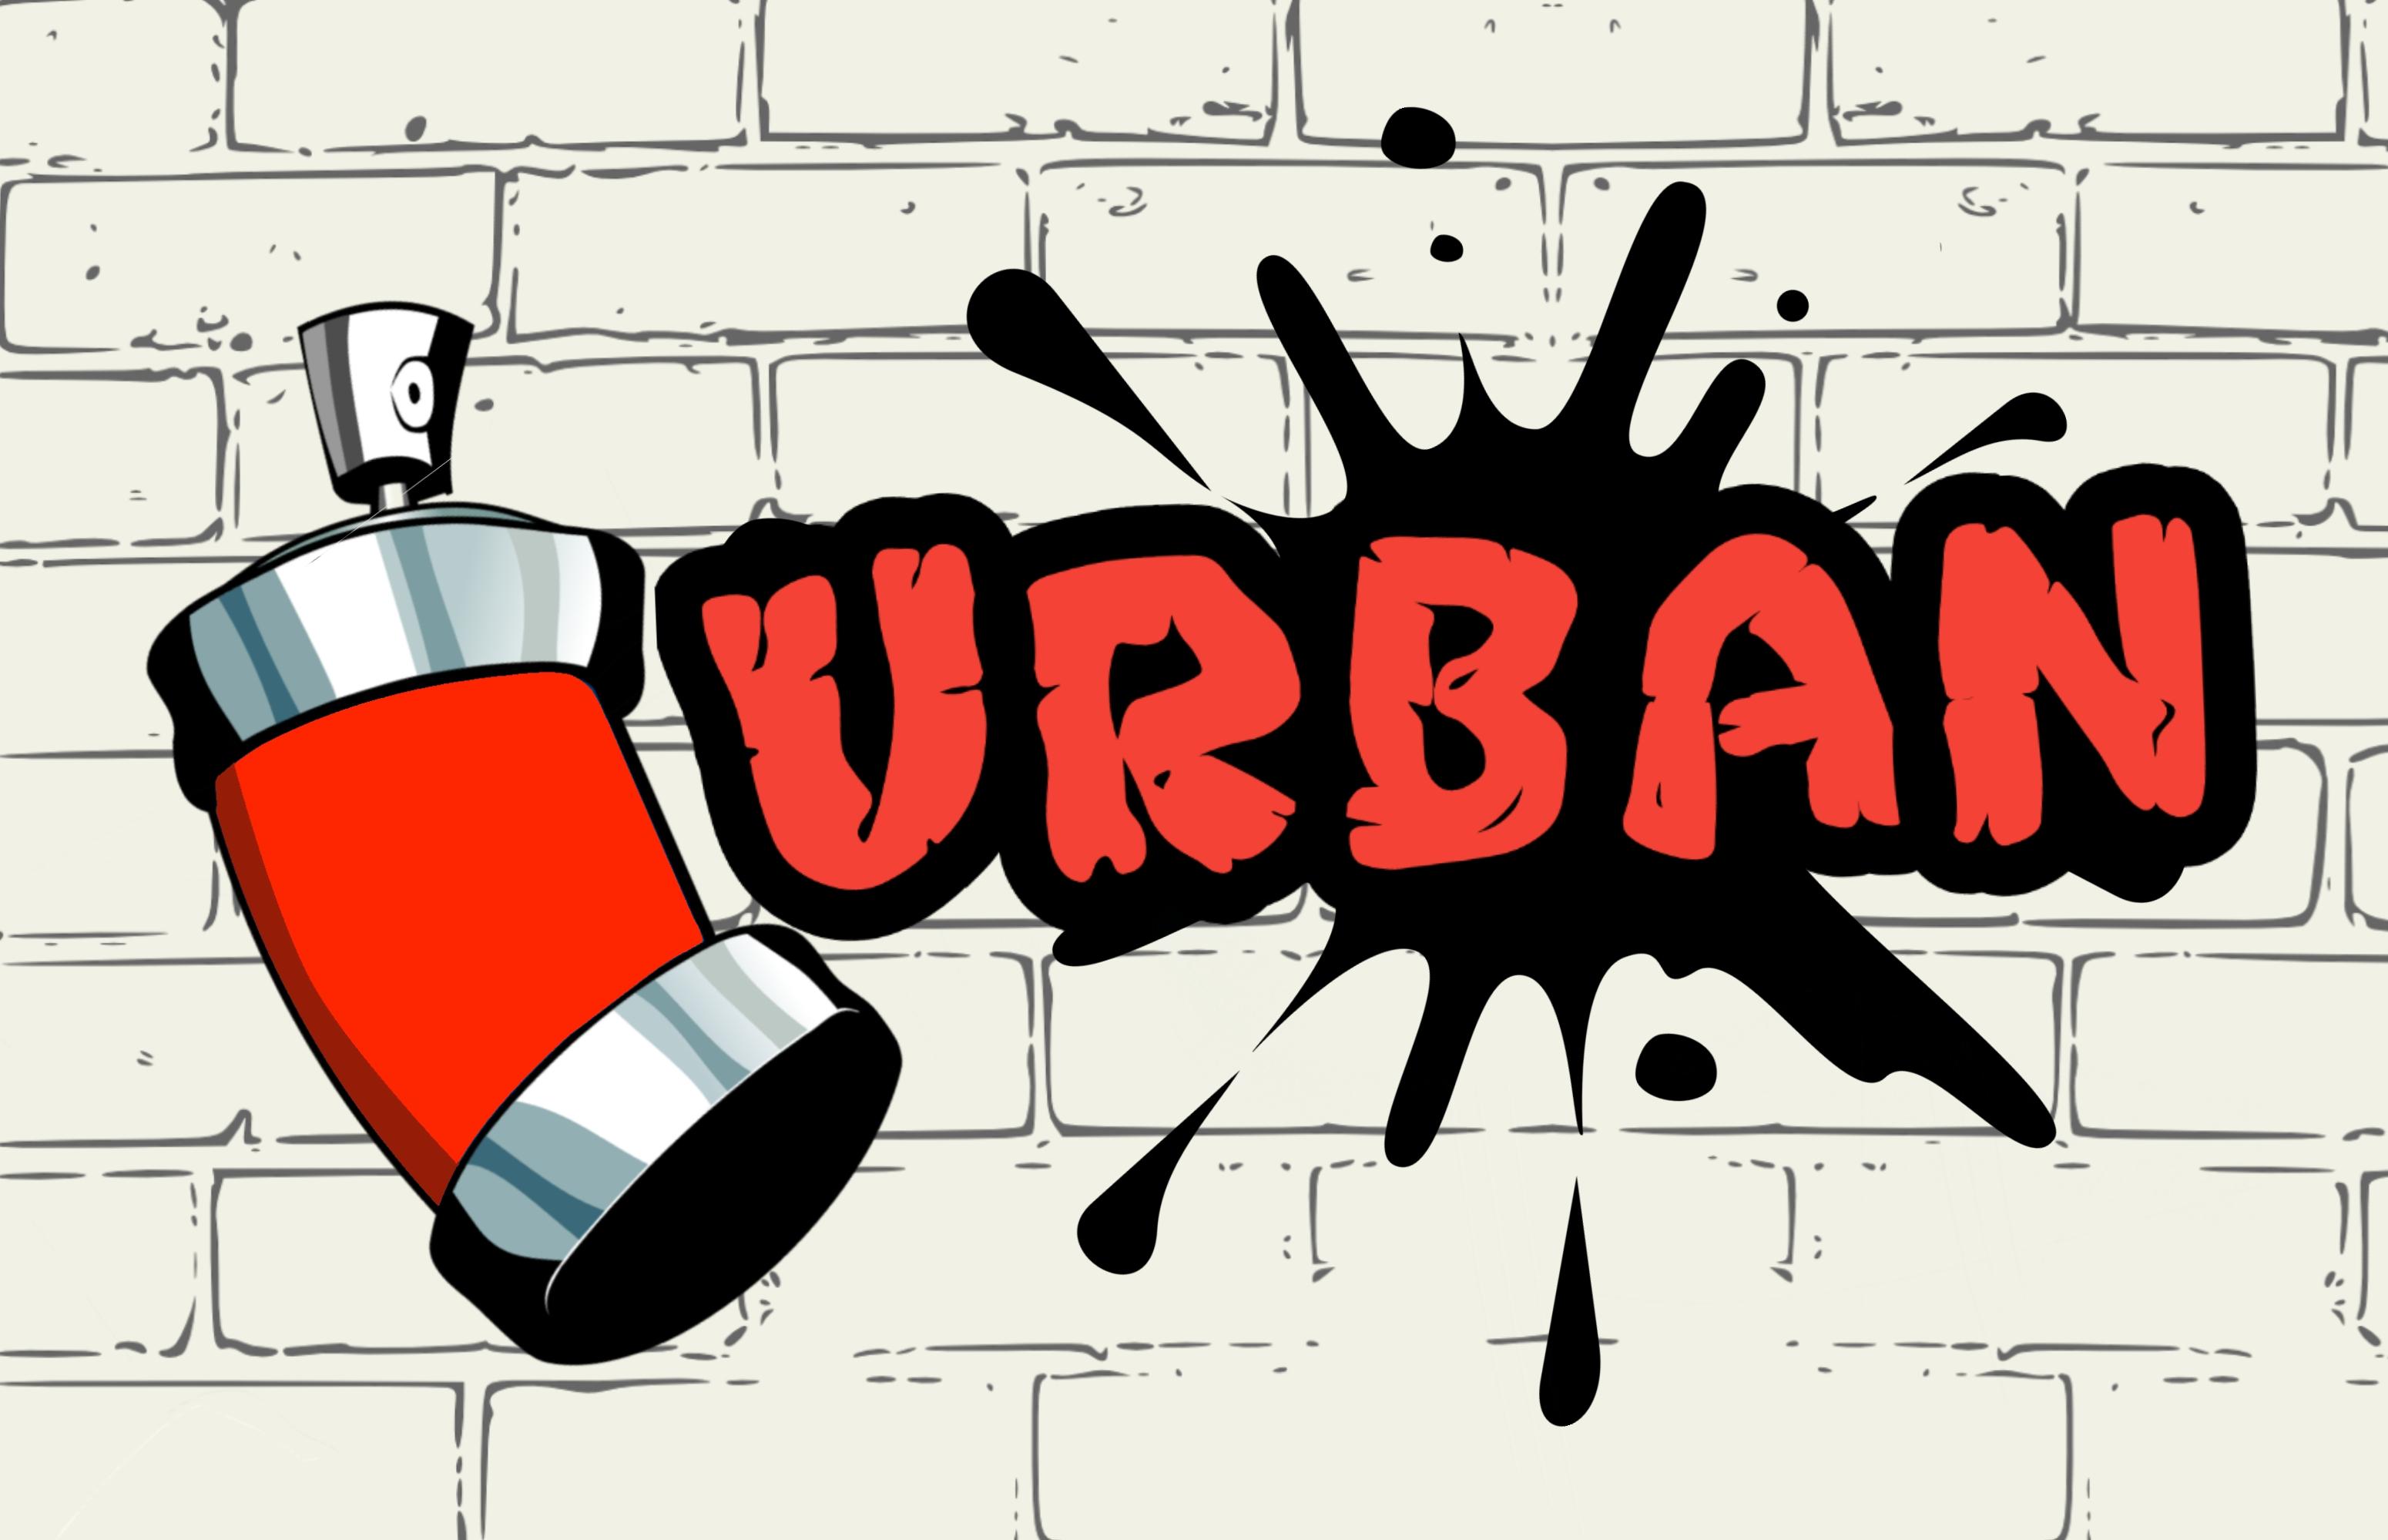 Free Images : graffiti, wall, spray, drawing, street, urban.